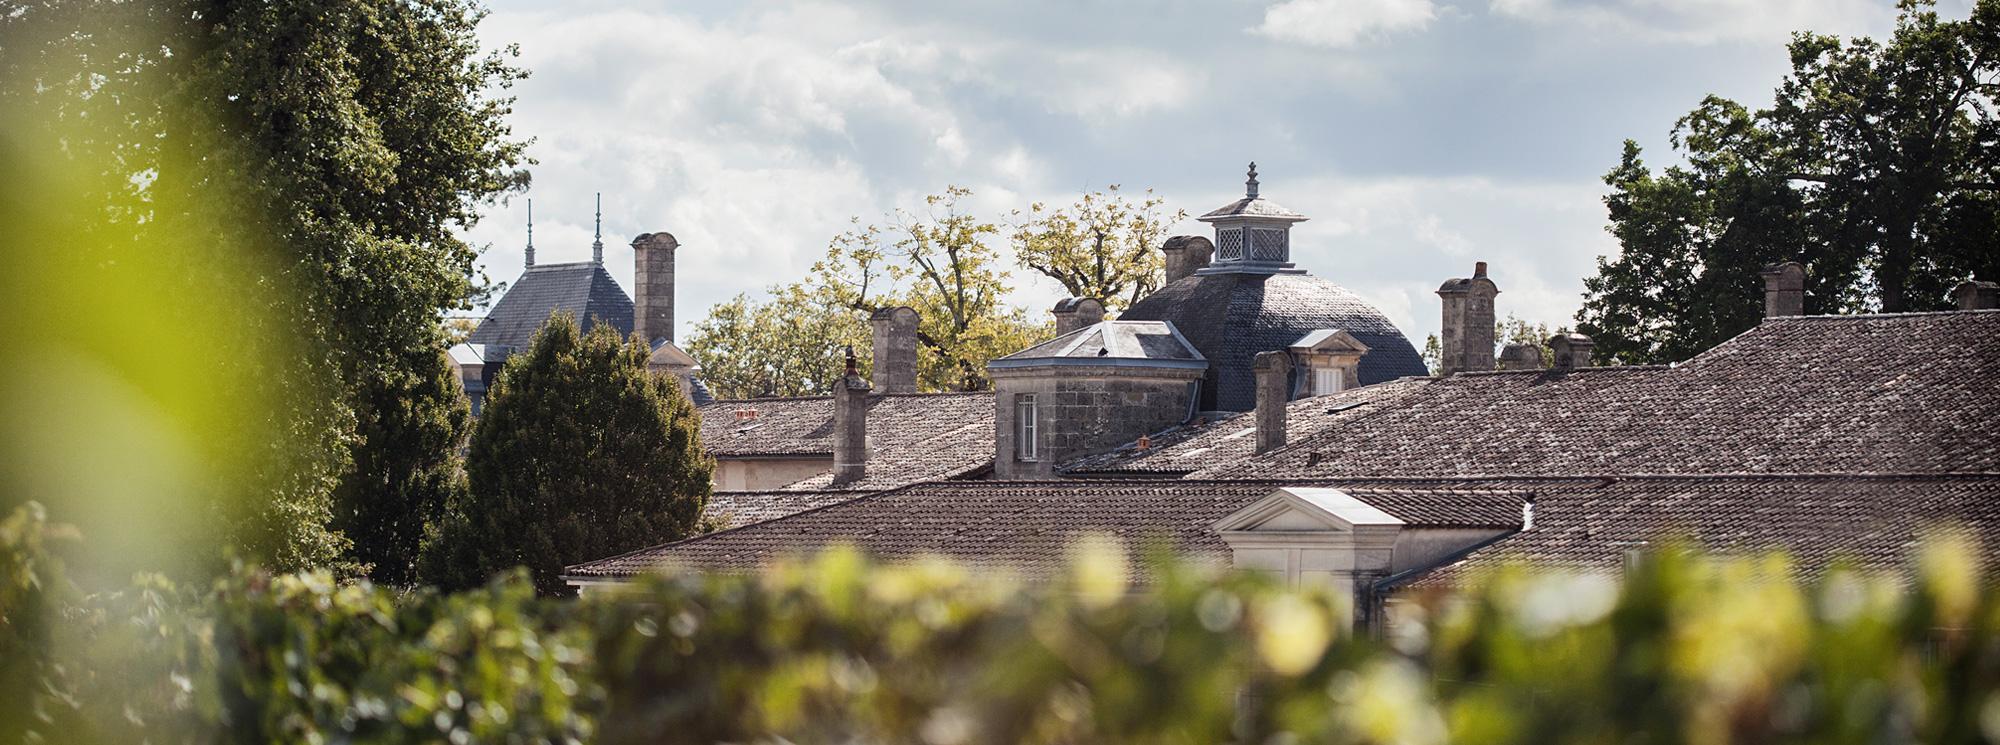 Château Beychevelle - 然后